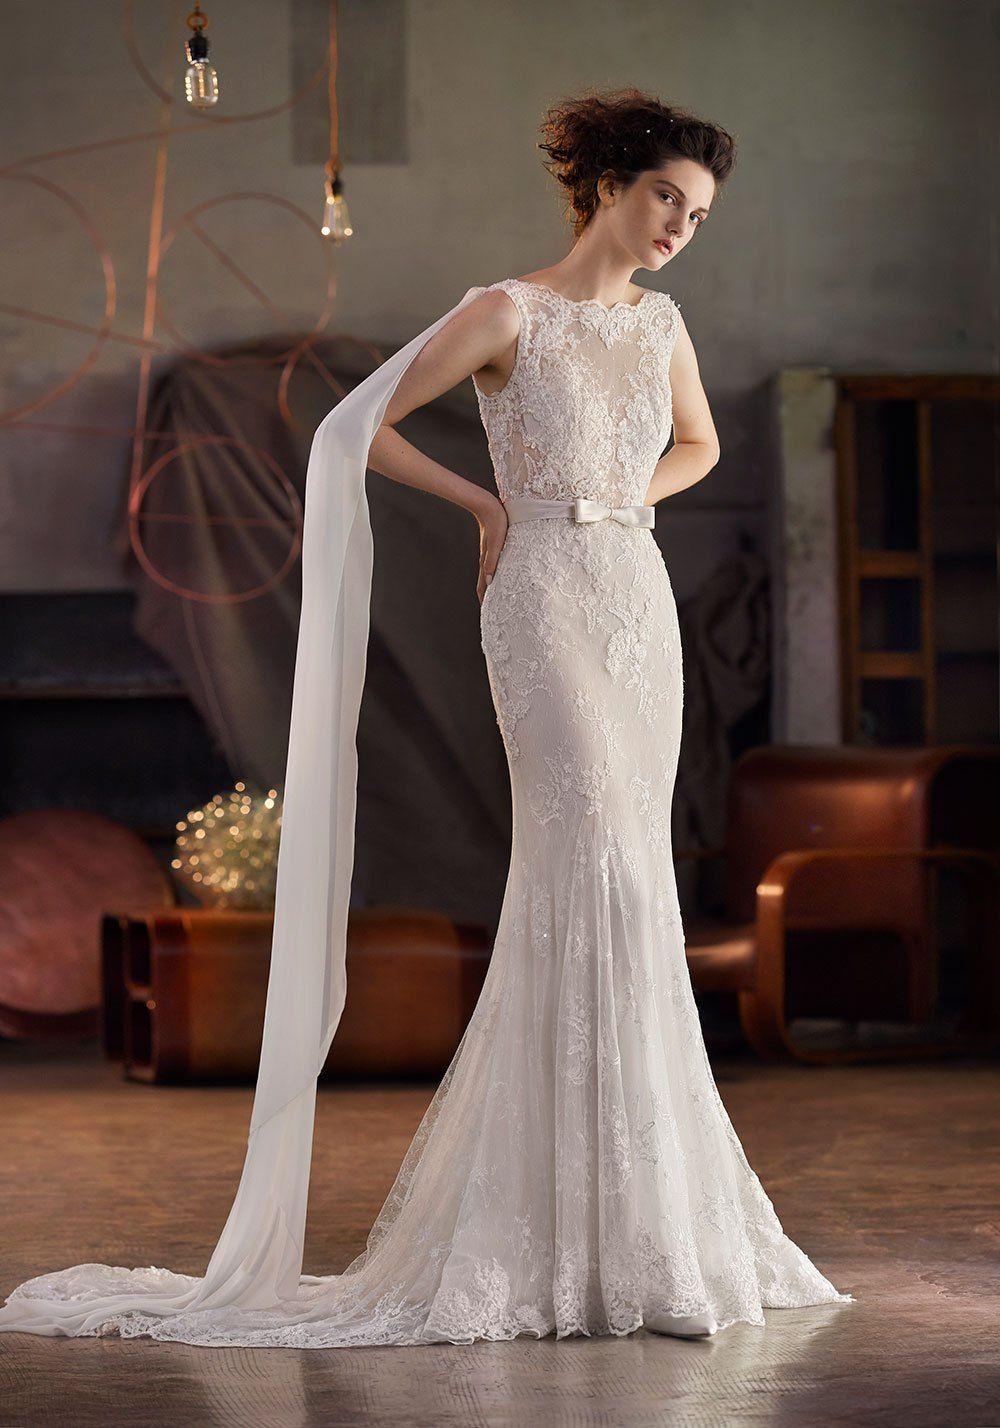 1930s style wedding dresses  Lusan Mandongus  Bridal Collection  bridal gown  Pinterest